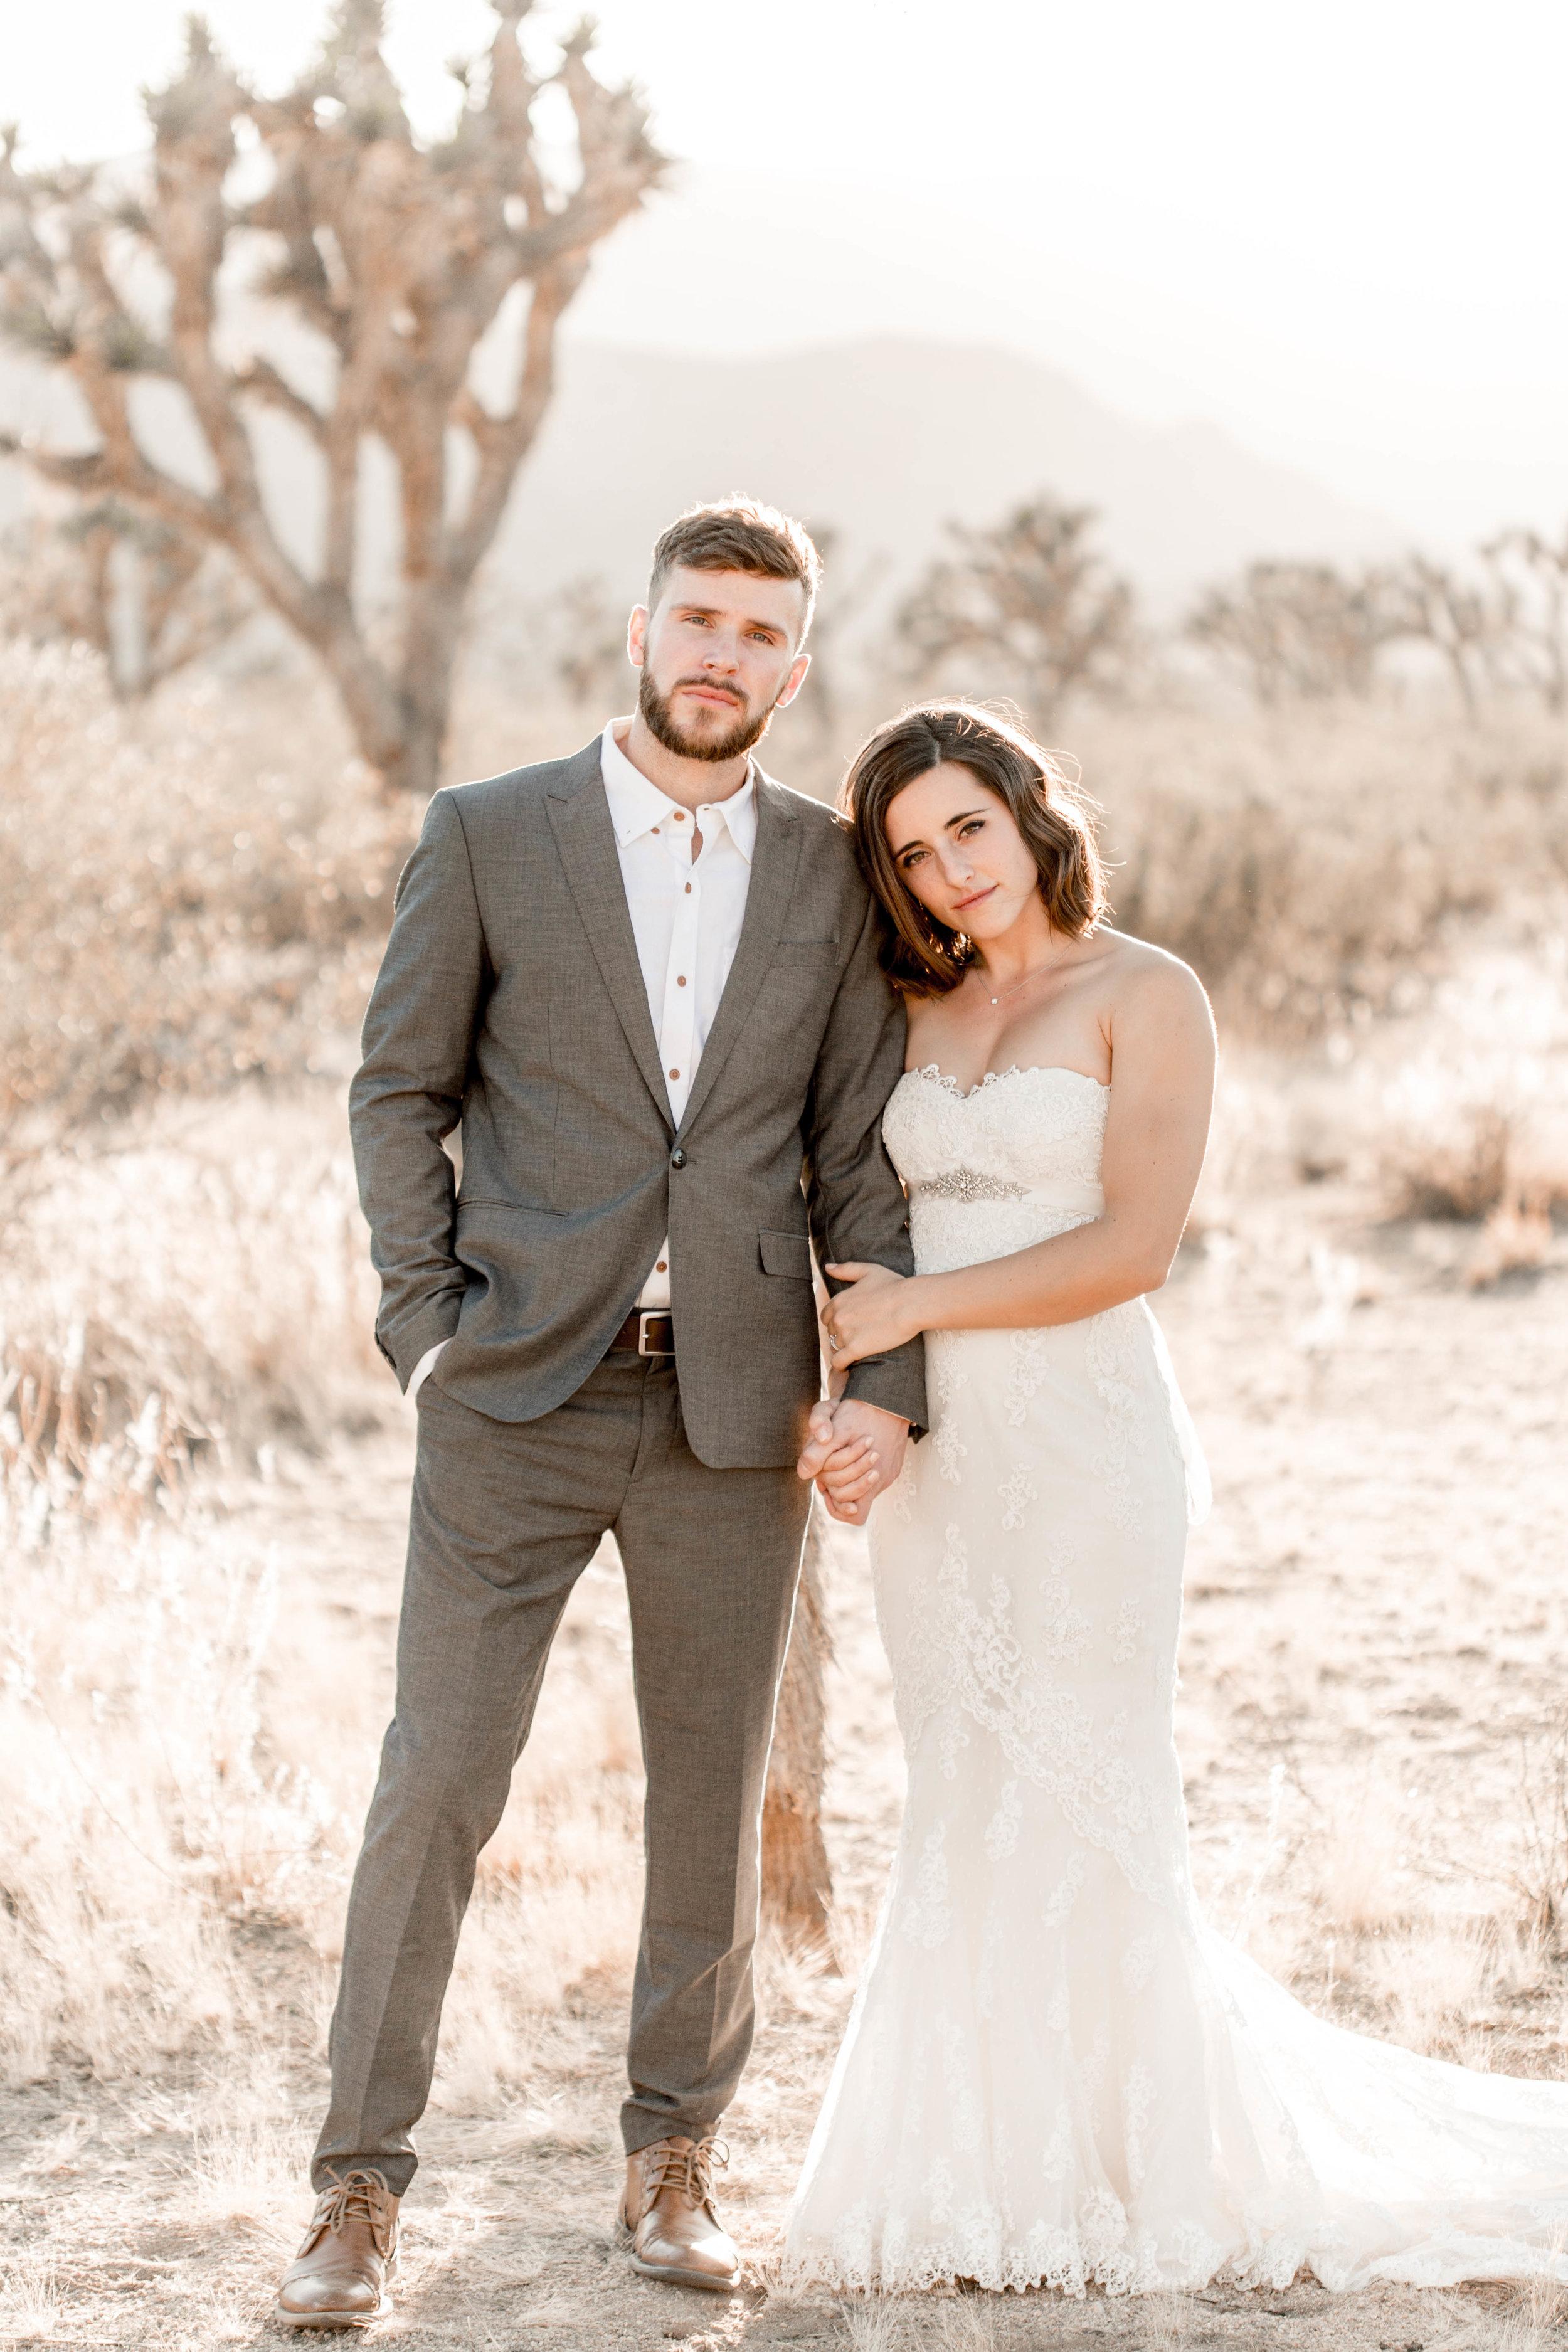 nicole-daacke-photography-joshua-tree-adventurous-elopement-wedding-national-park-wedding-photographer-adventure-wedding-adventurous-elopement-jtree-joshua-tree-national-park-wedding-photographer-intimate-weddings-golden-desert-love-11.jpg